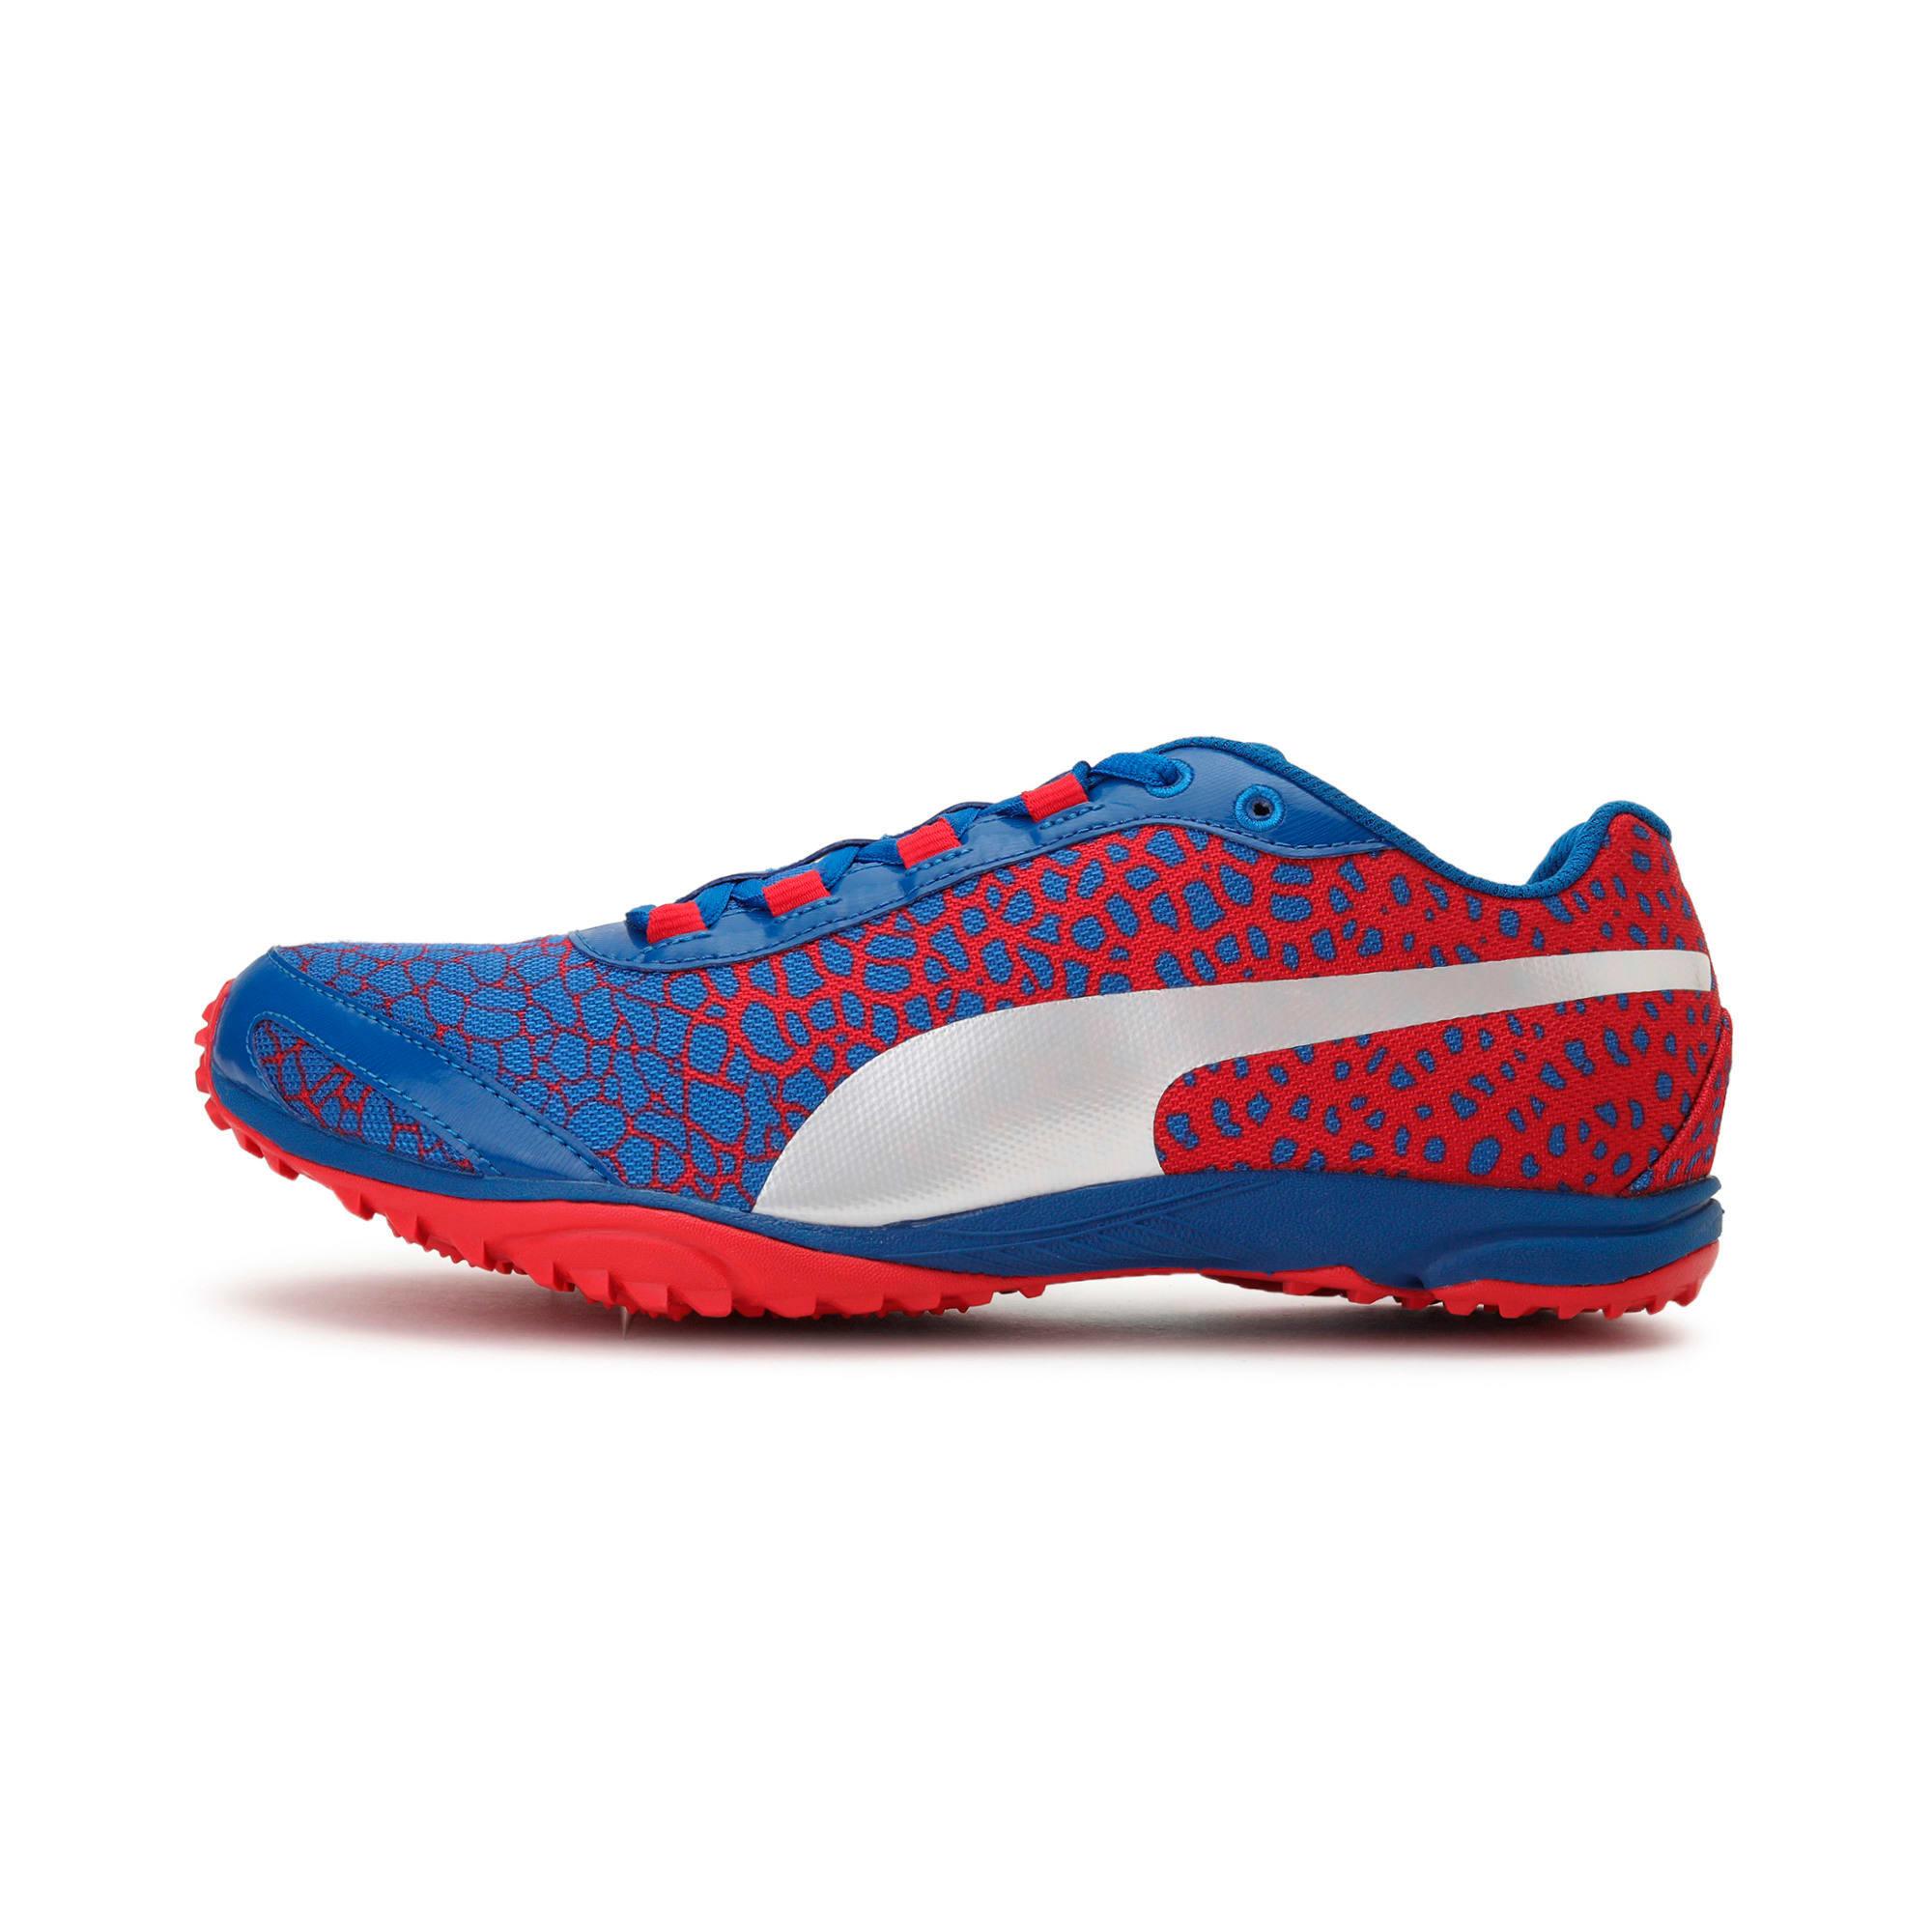 Thumbnail 1 of evoSPEED Haraka 4 Men's Cross Country Running Shoes, Lapis Blue-Toreador, medium-IND